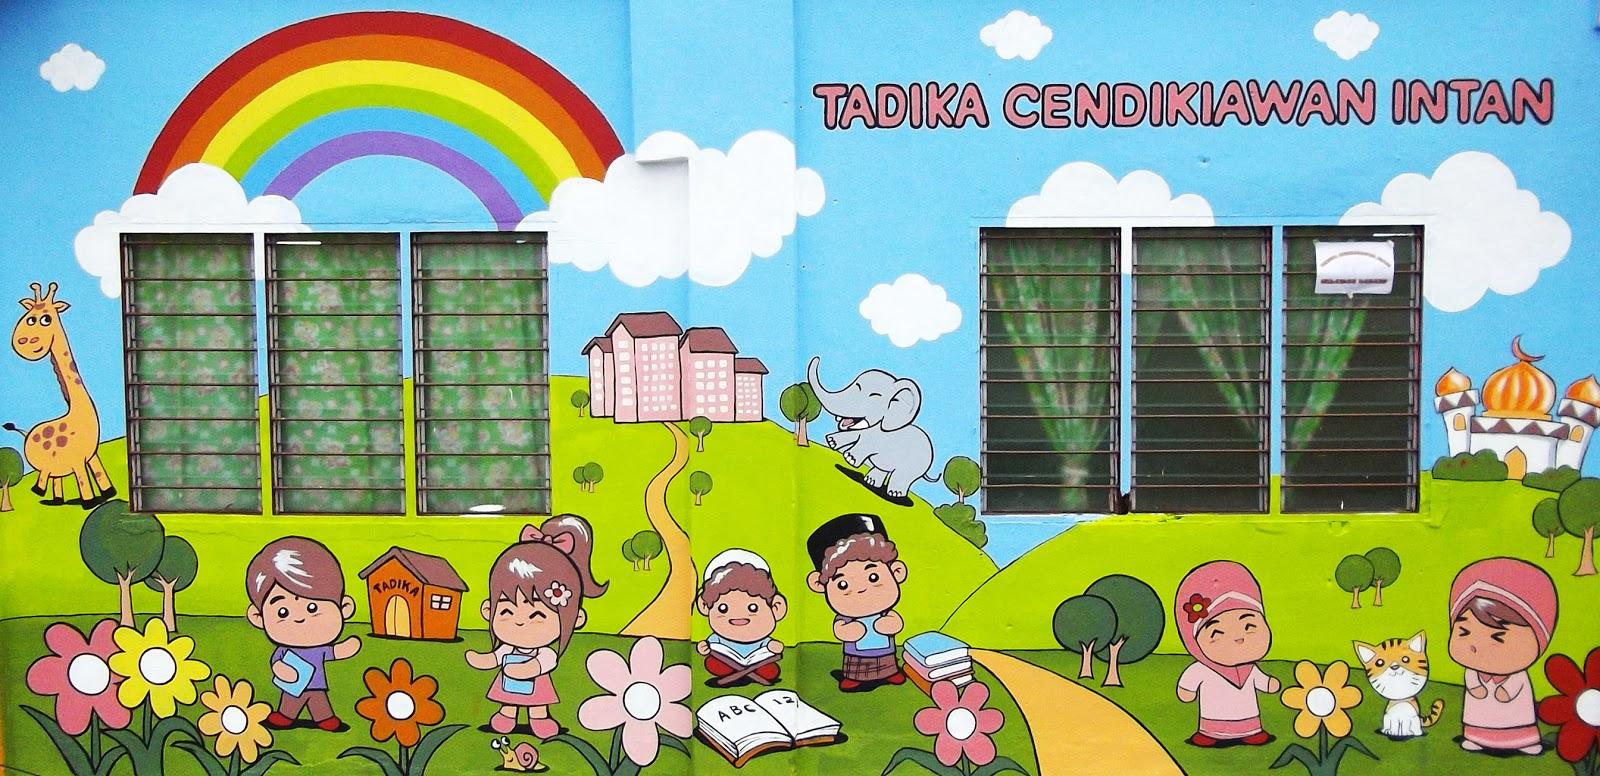 Warna arts mural art painting for all for Contoh lukisan mural tadika